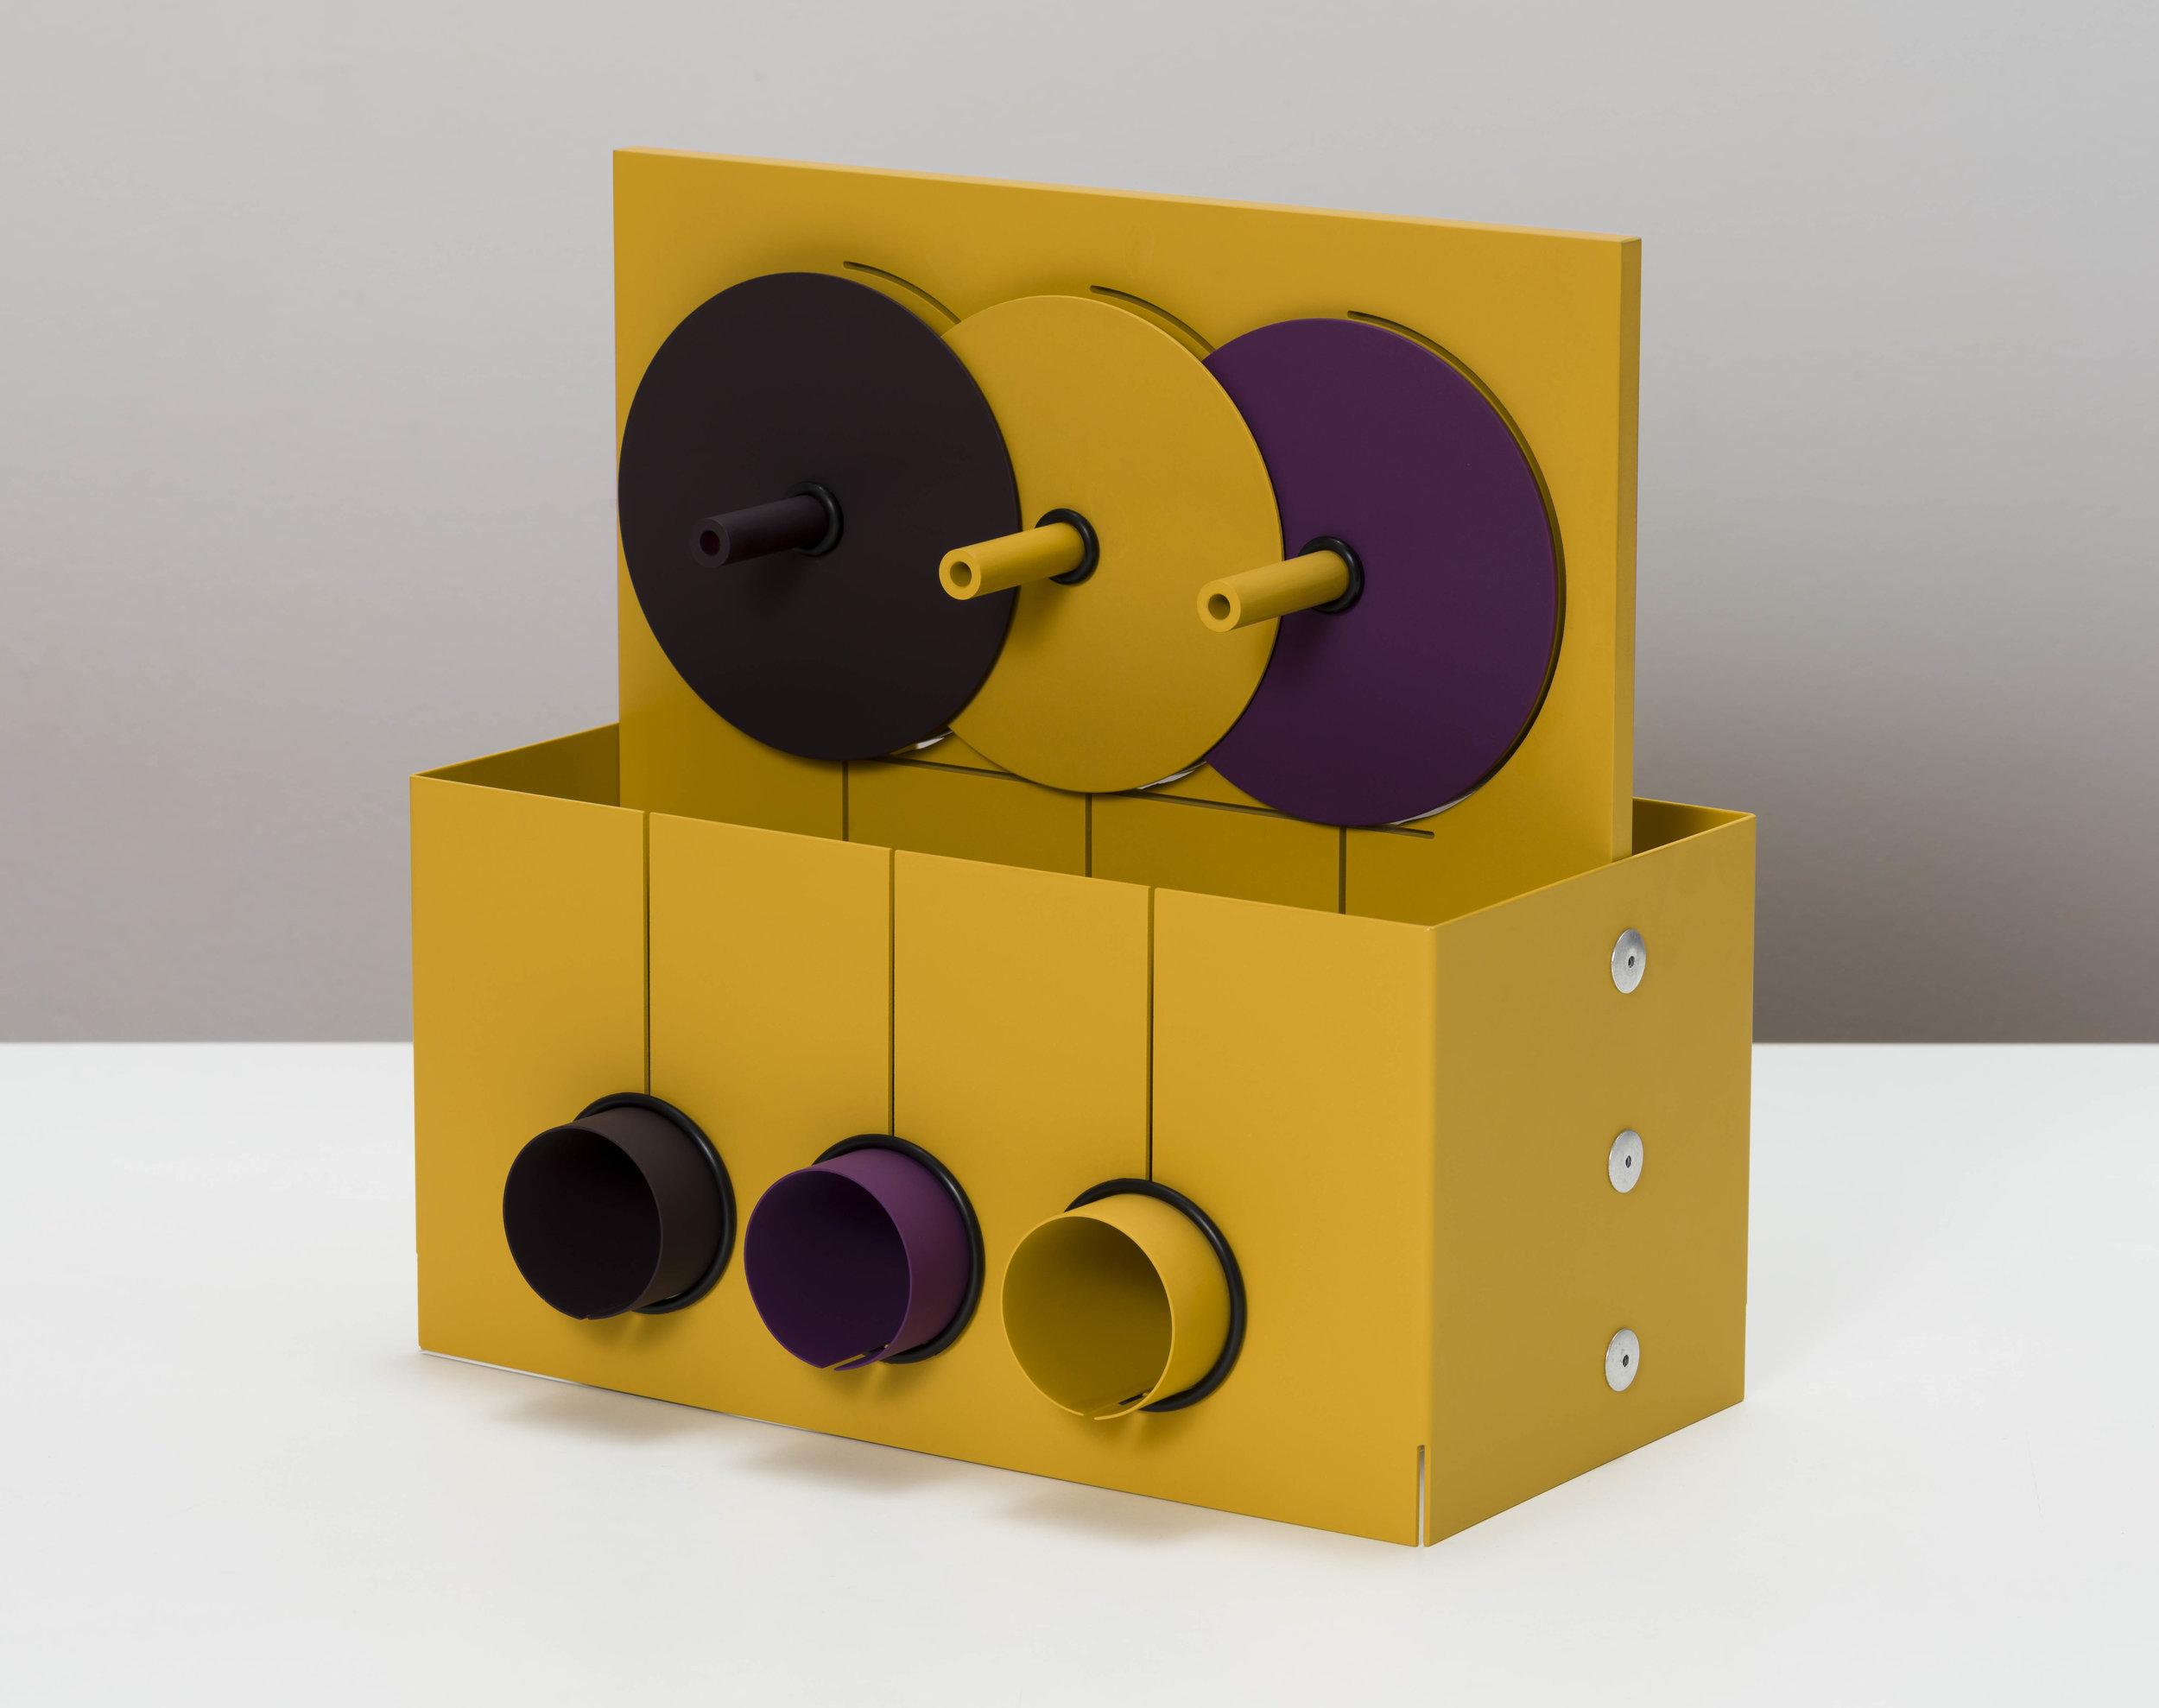 Matt Paweski,  Grape Pulley , 2019, aluminum, aluminum rivets, rubber o-rings, vinyl paint, 12 × 12 × 6 inches (30.5 × 30.5 × 15.2 cm)